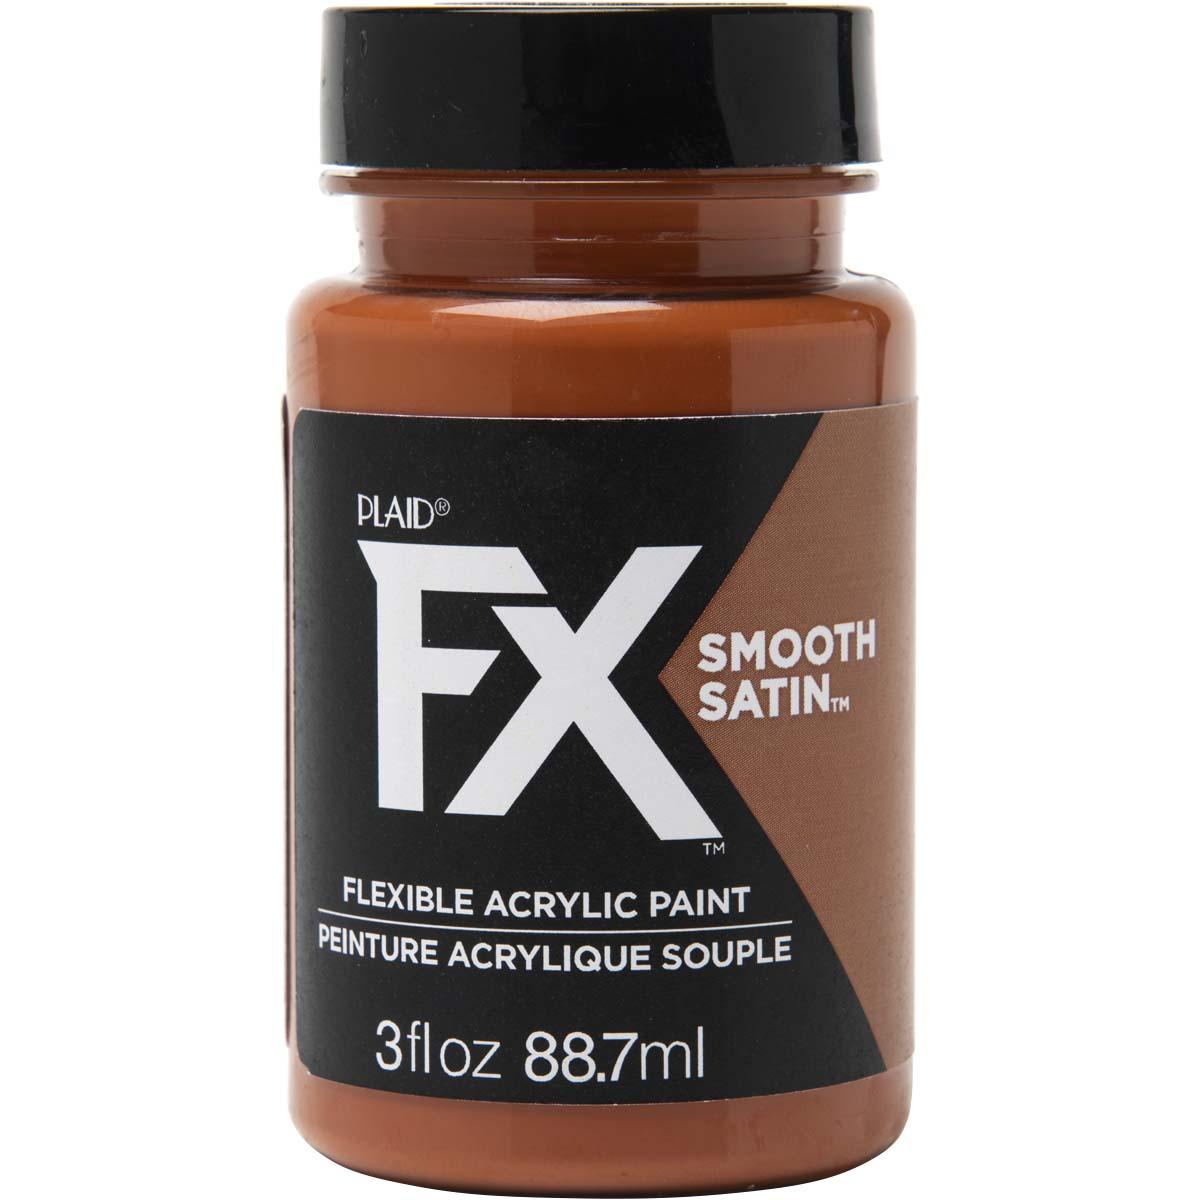 PlaidFX Smooth Satin Flexible Acrylic Paint - Mudflow, 3 oz. - 36869